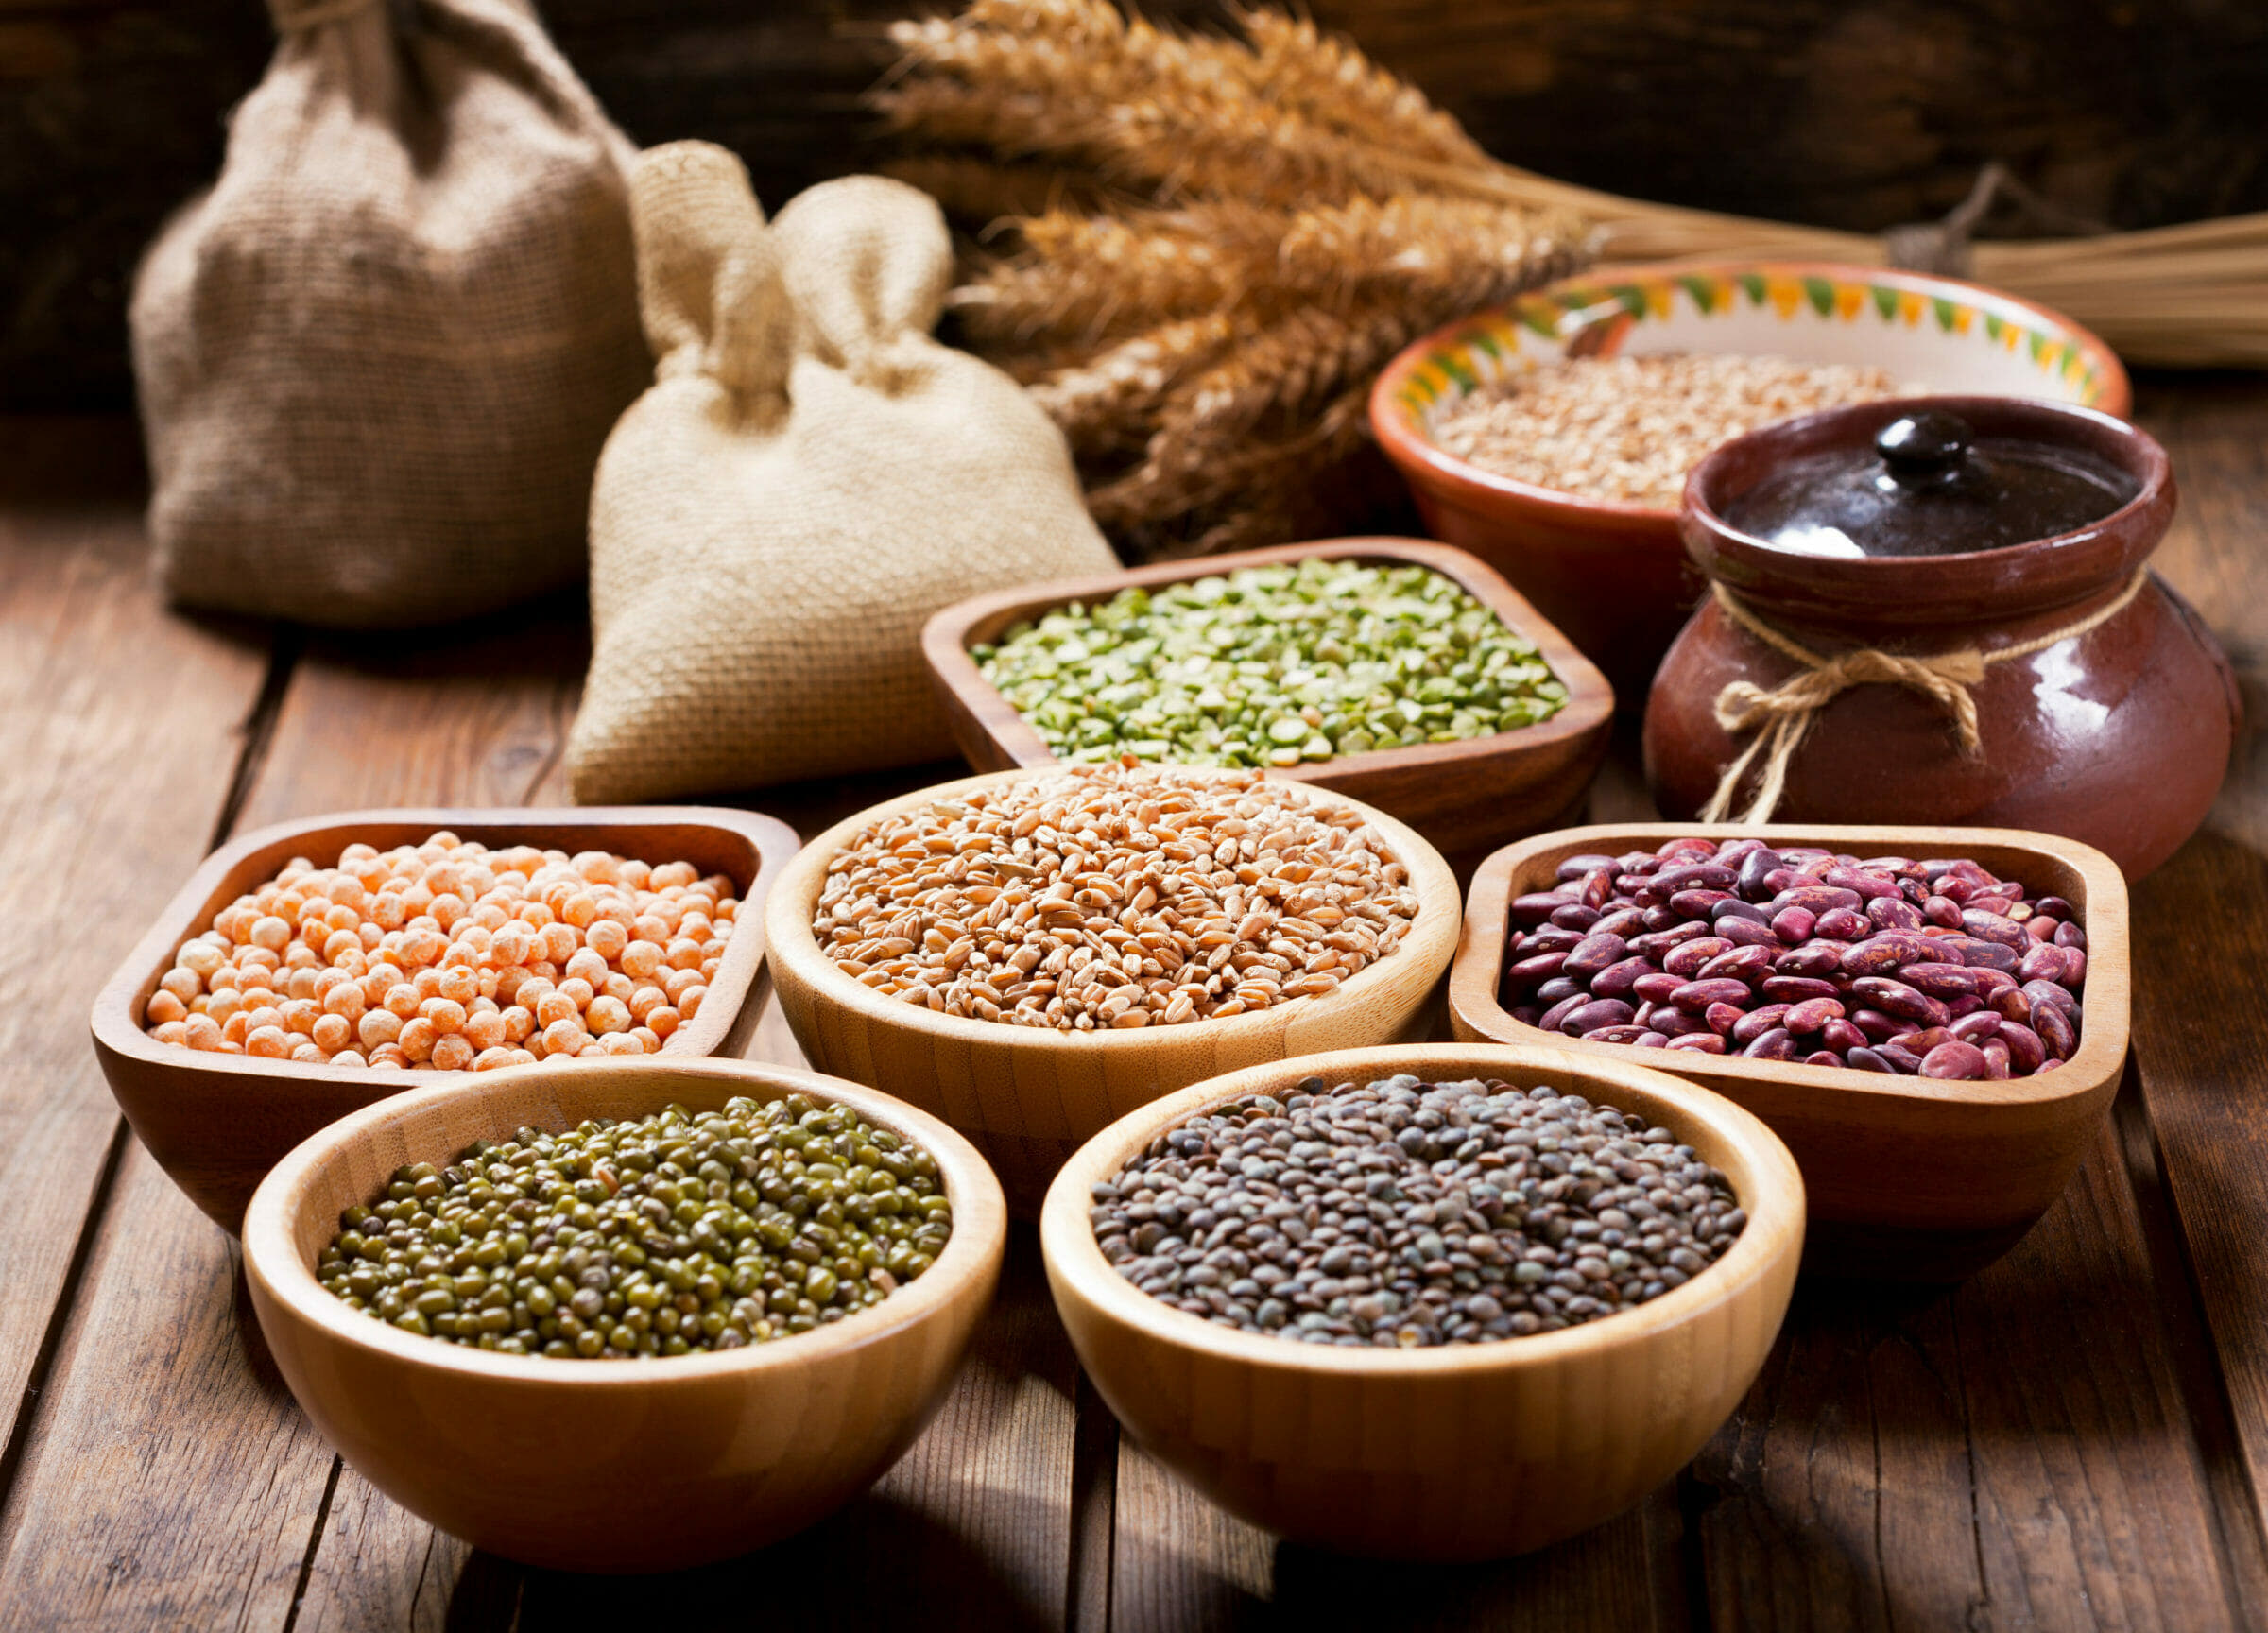 Legumes provide low nutritional value